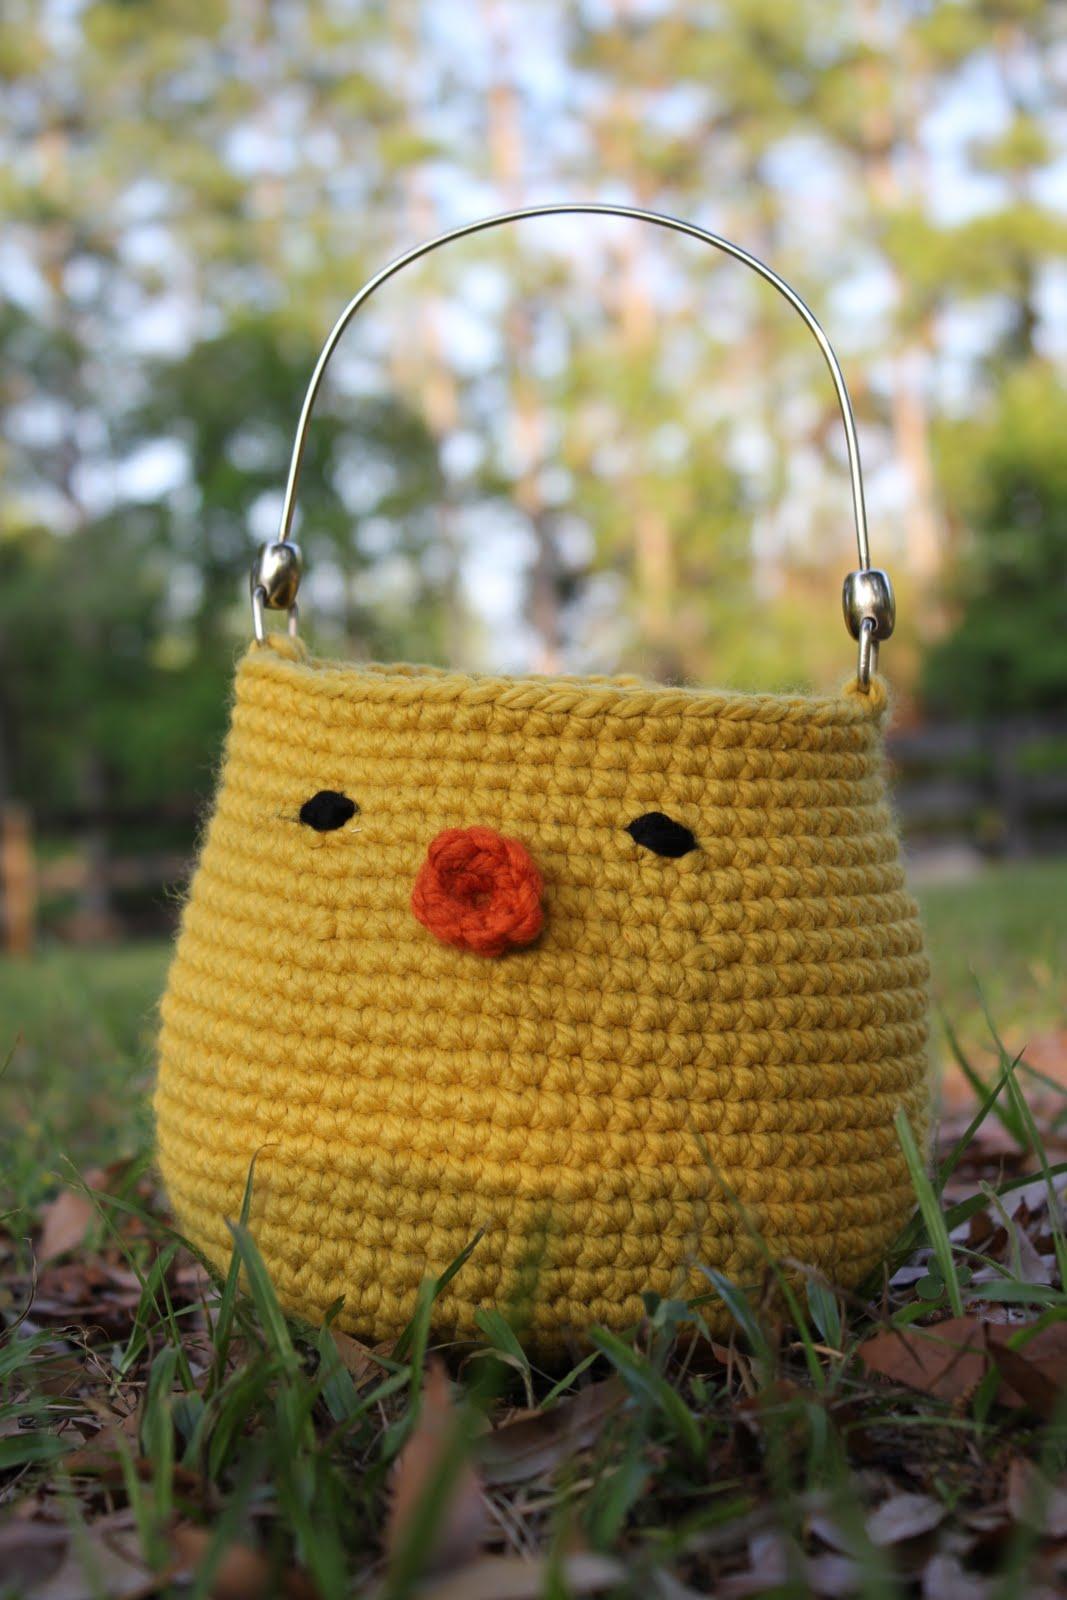 Free Crochet Pattern For Easter Basket : Handmade Easter Craft along ? Day one: Crochet Chick ...